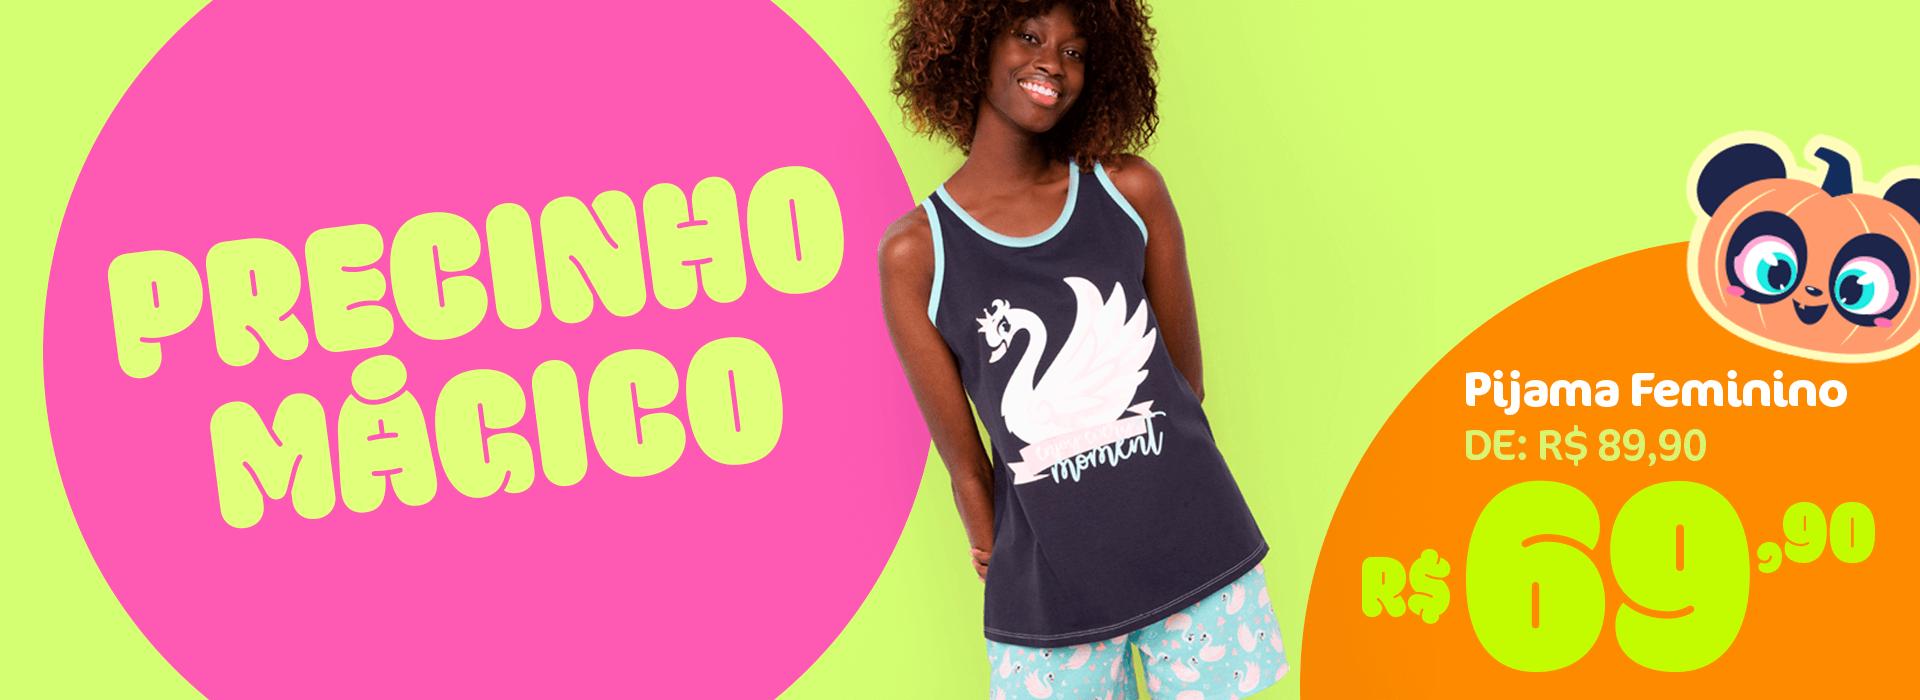 Banner B: Pijama Cisne Feminino de 89,90 por 69,90